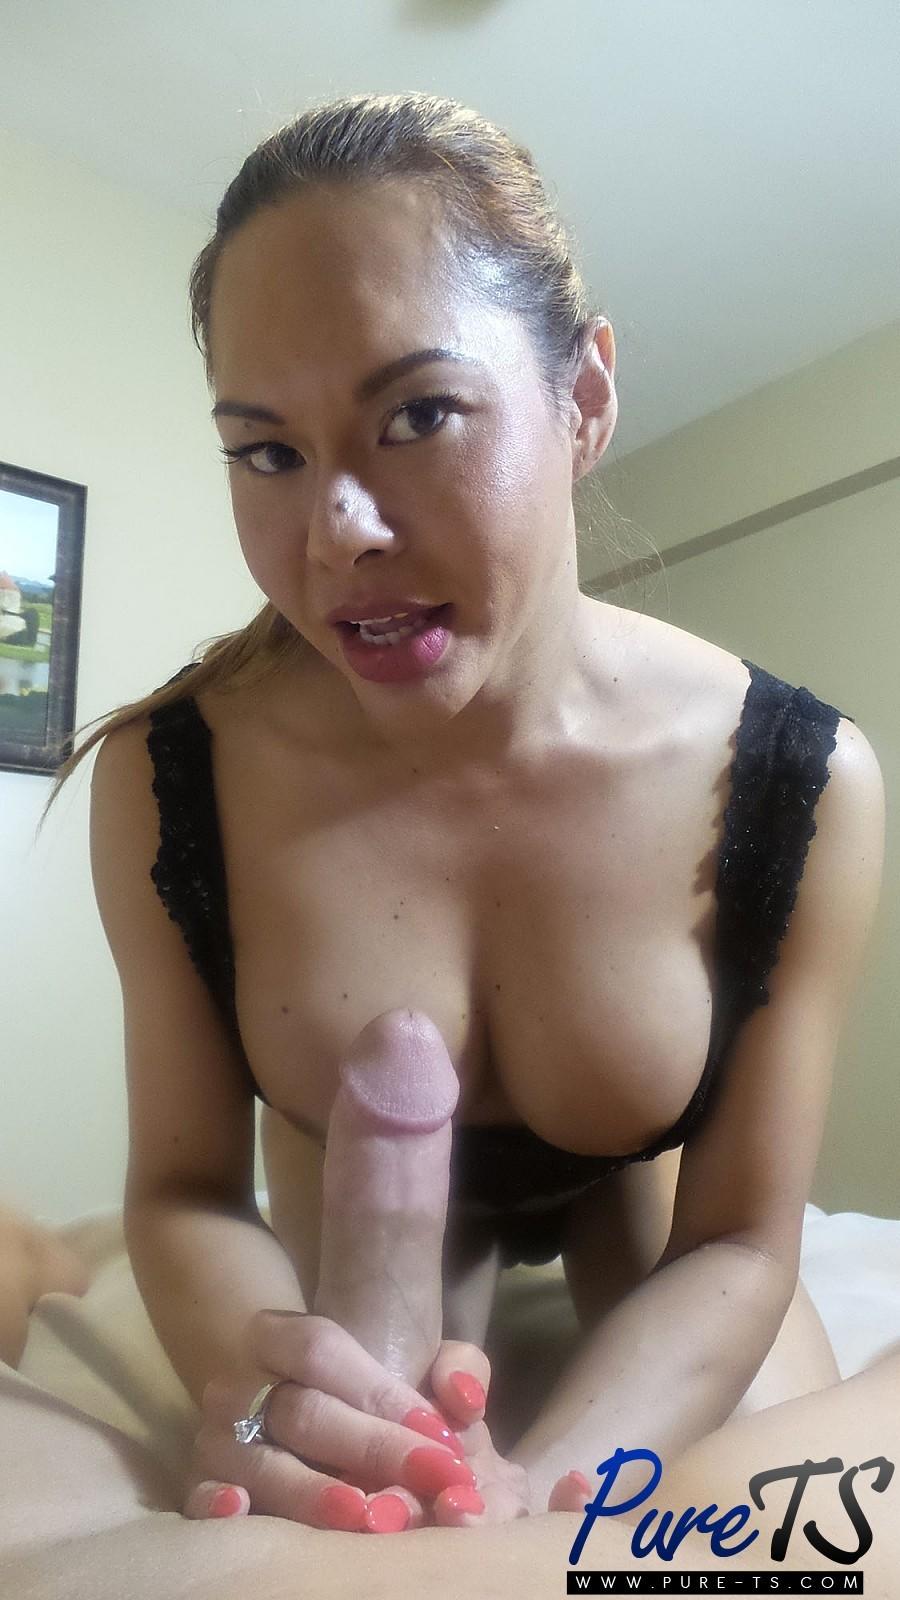 Amanda Jade Is A Spicy Thai Escort In The Bay Area. She